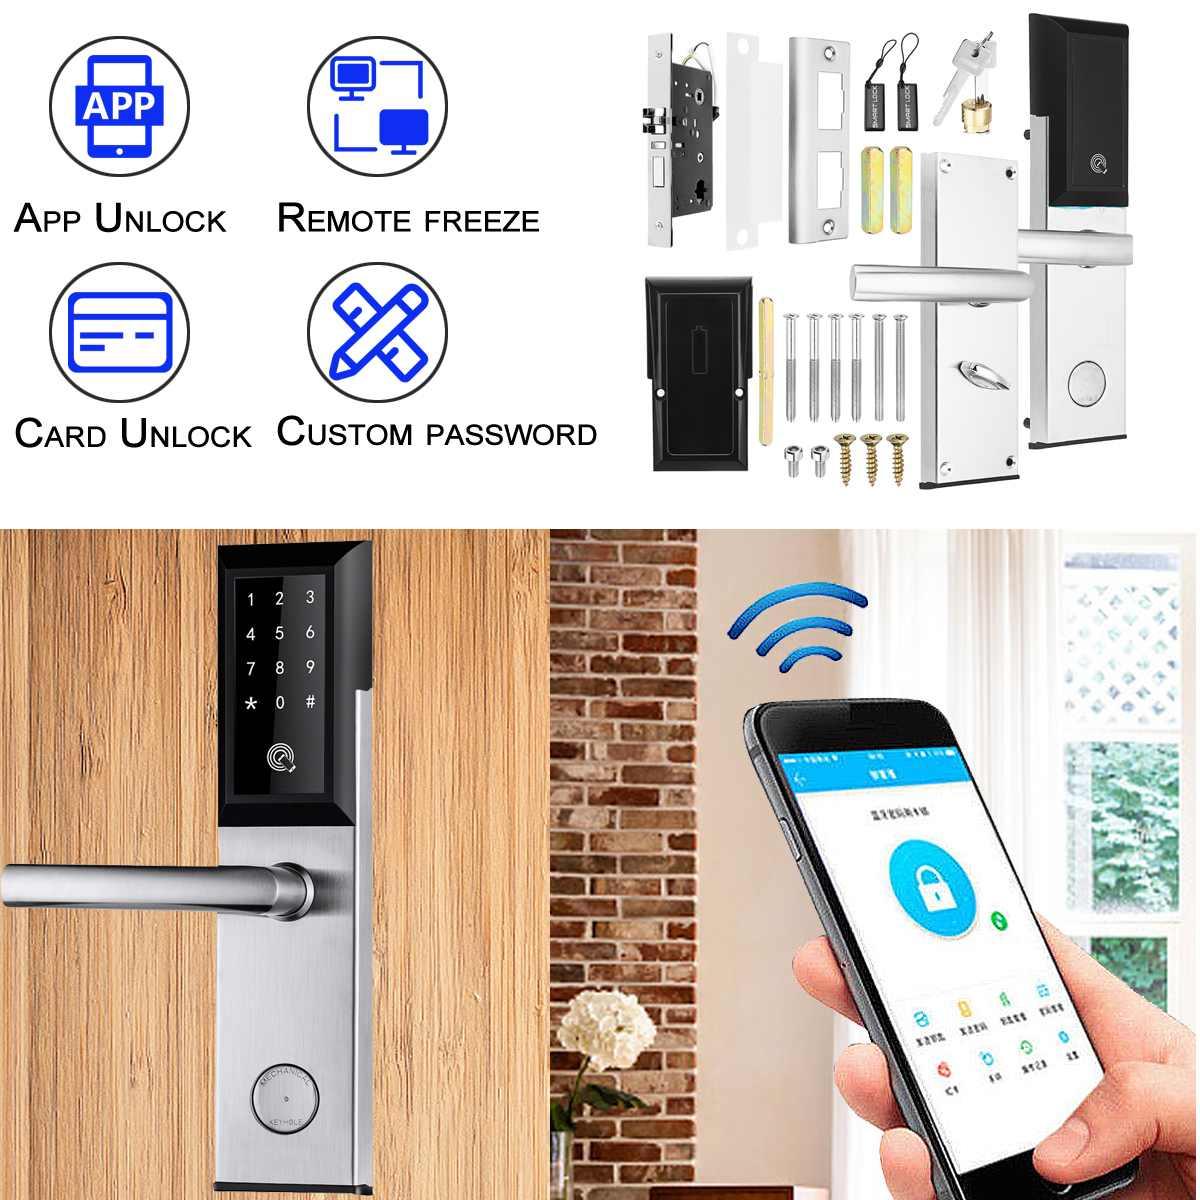 Security Electronic Door Lock bluetooth APP WiFi Intelligent Lock  Verification With Password Unlock Smart ScreenSecurity Electronic Door Lock bluetooth APP WiFi Intelligent Lock  Verification With Password Unlock Smart Screen